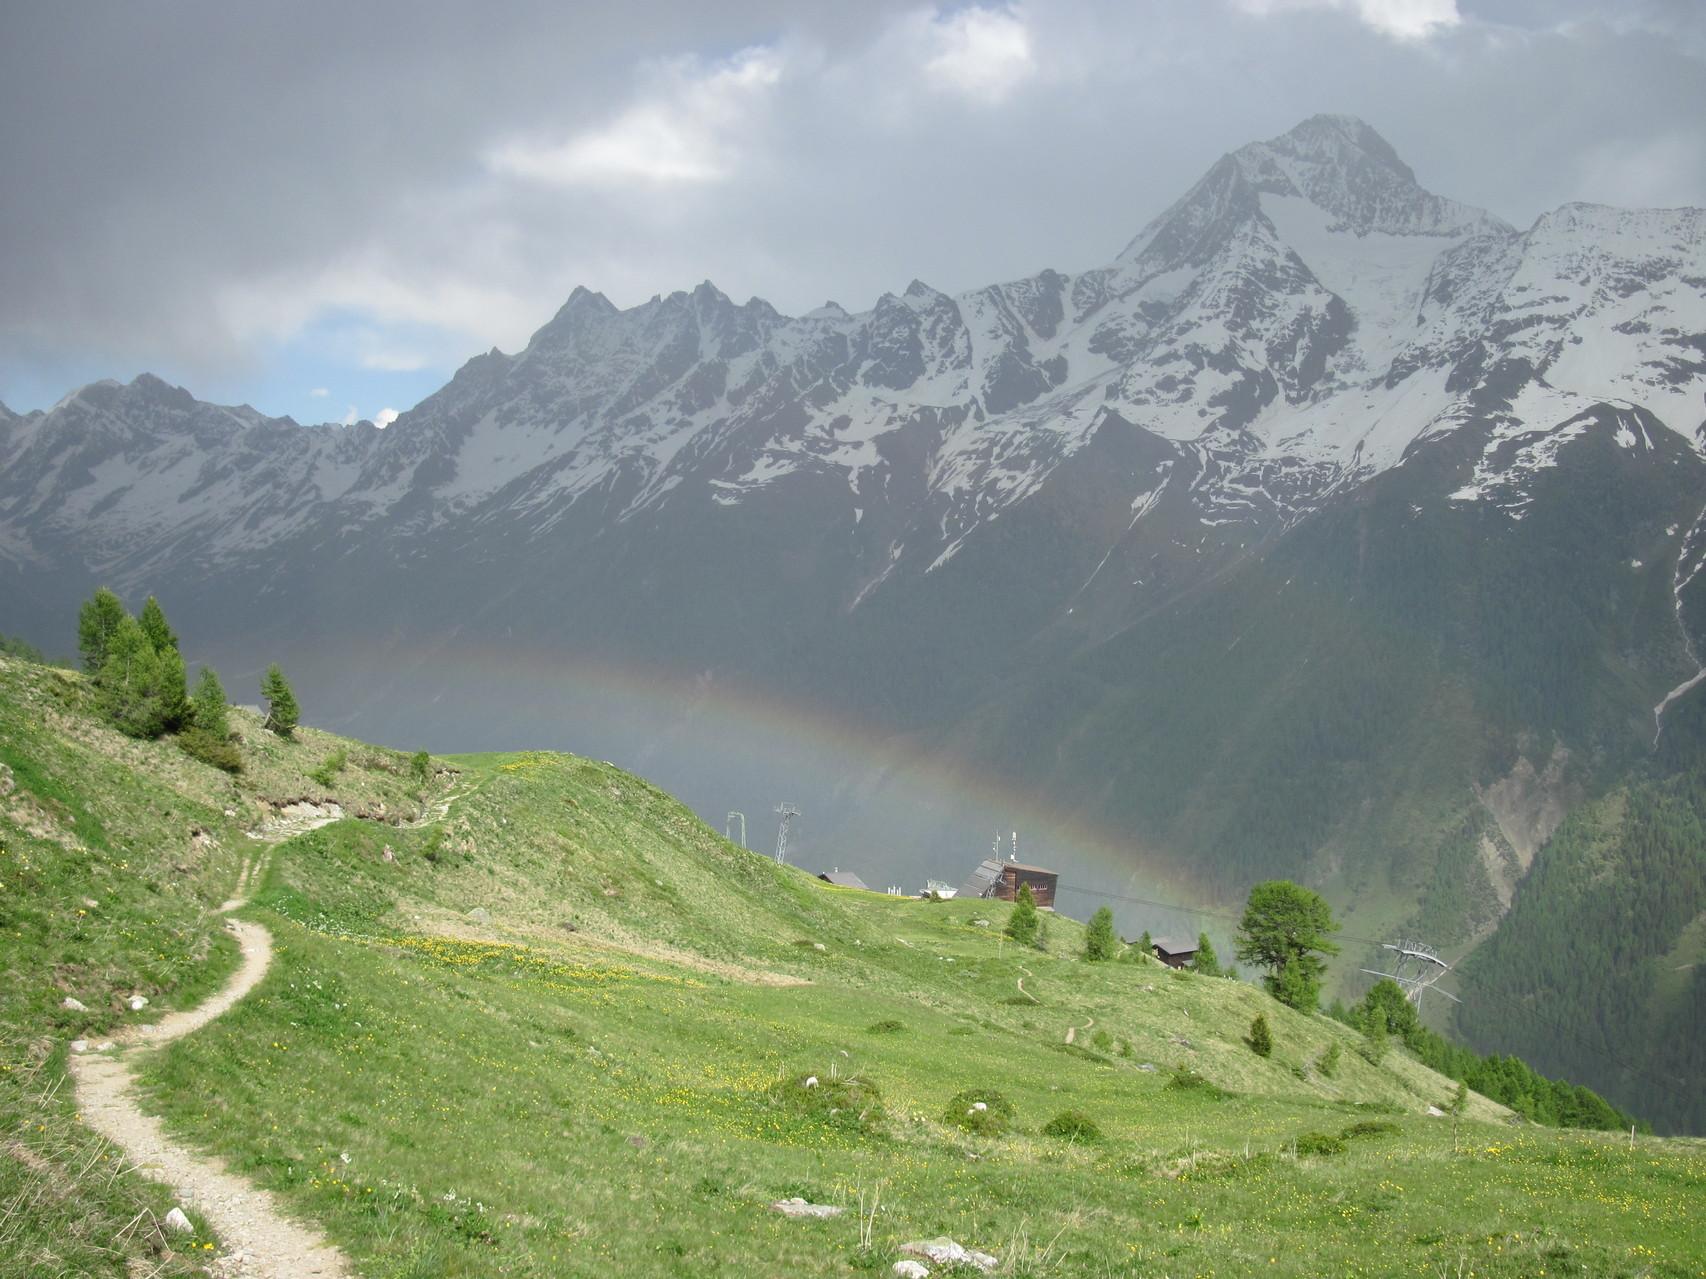 Regenbogen über Lauchernalp